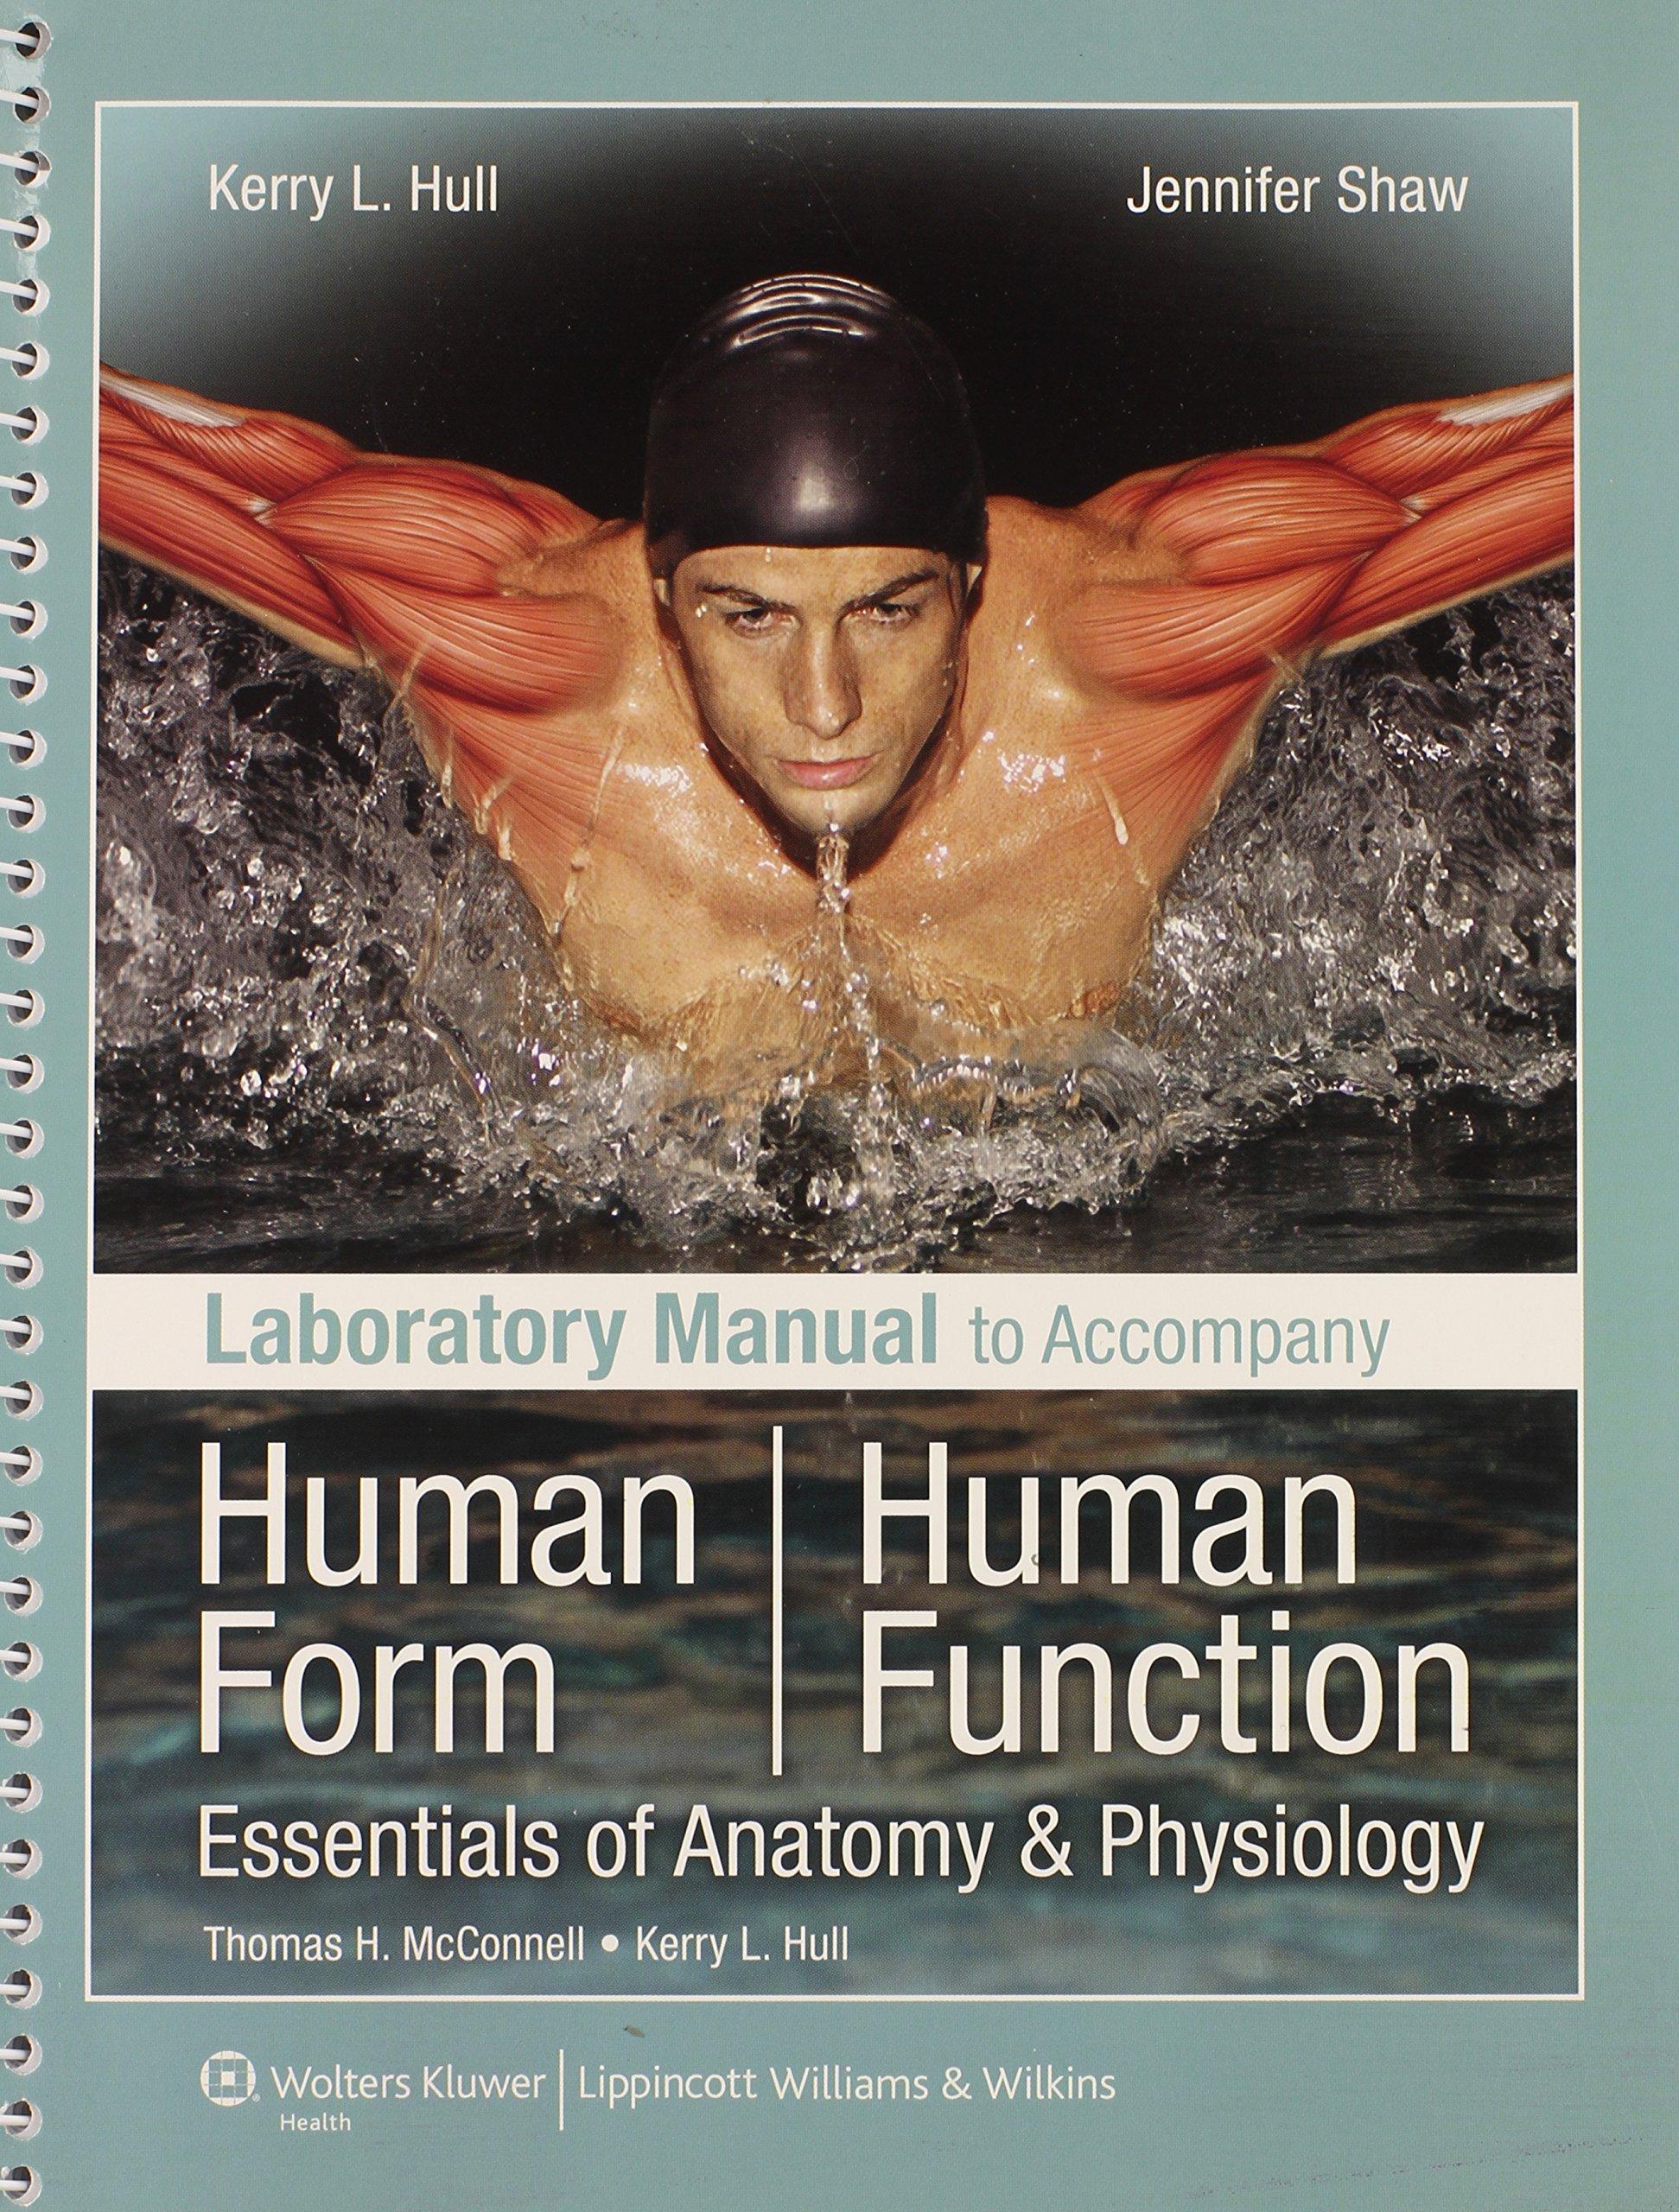 Laboratory Manual to Accompany Human Form, Human Function ...